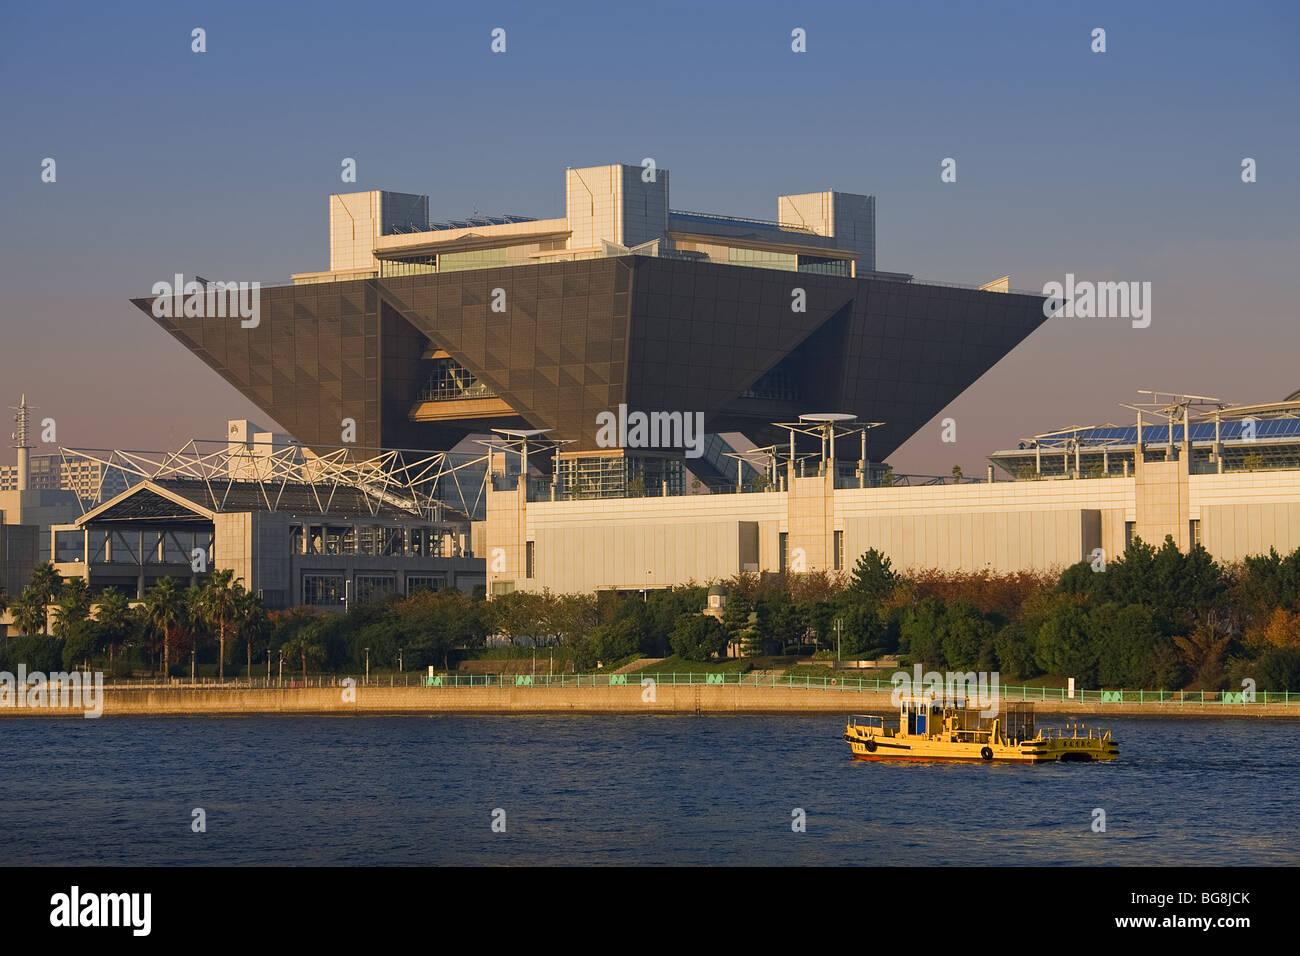 International Exhibition Center in Tokyo (TOKYO BIG SIGHT). - Stock Image